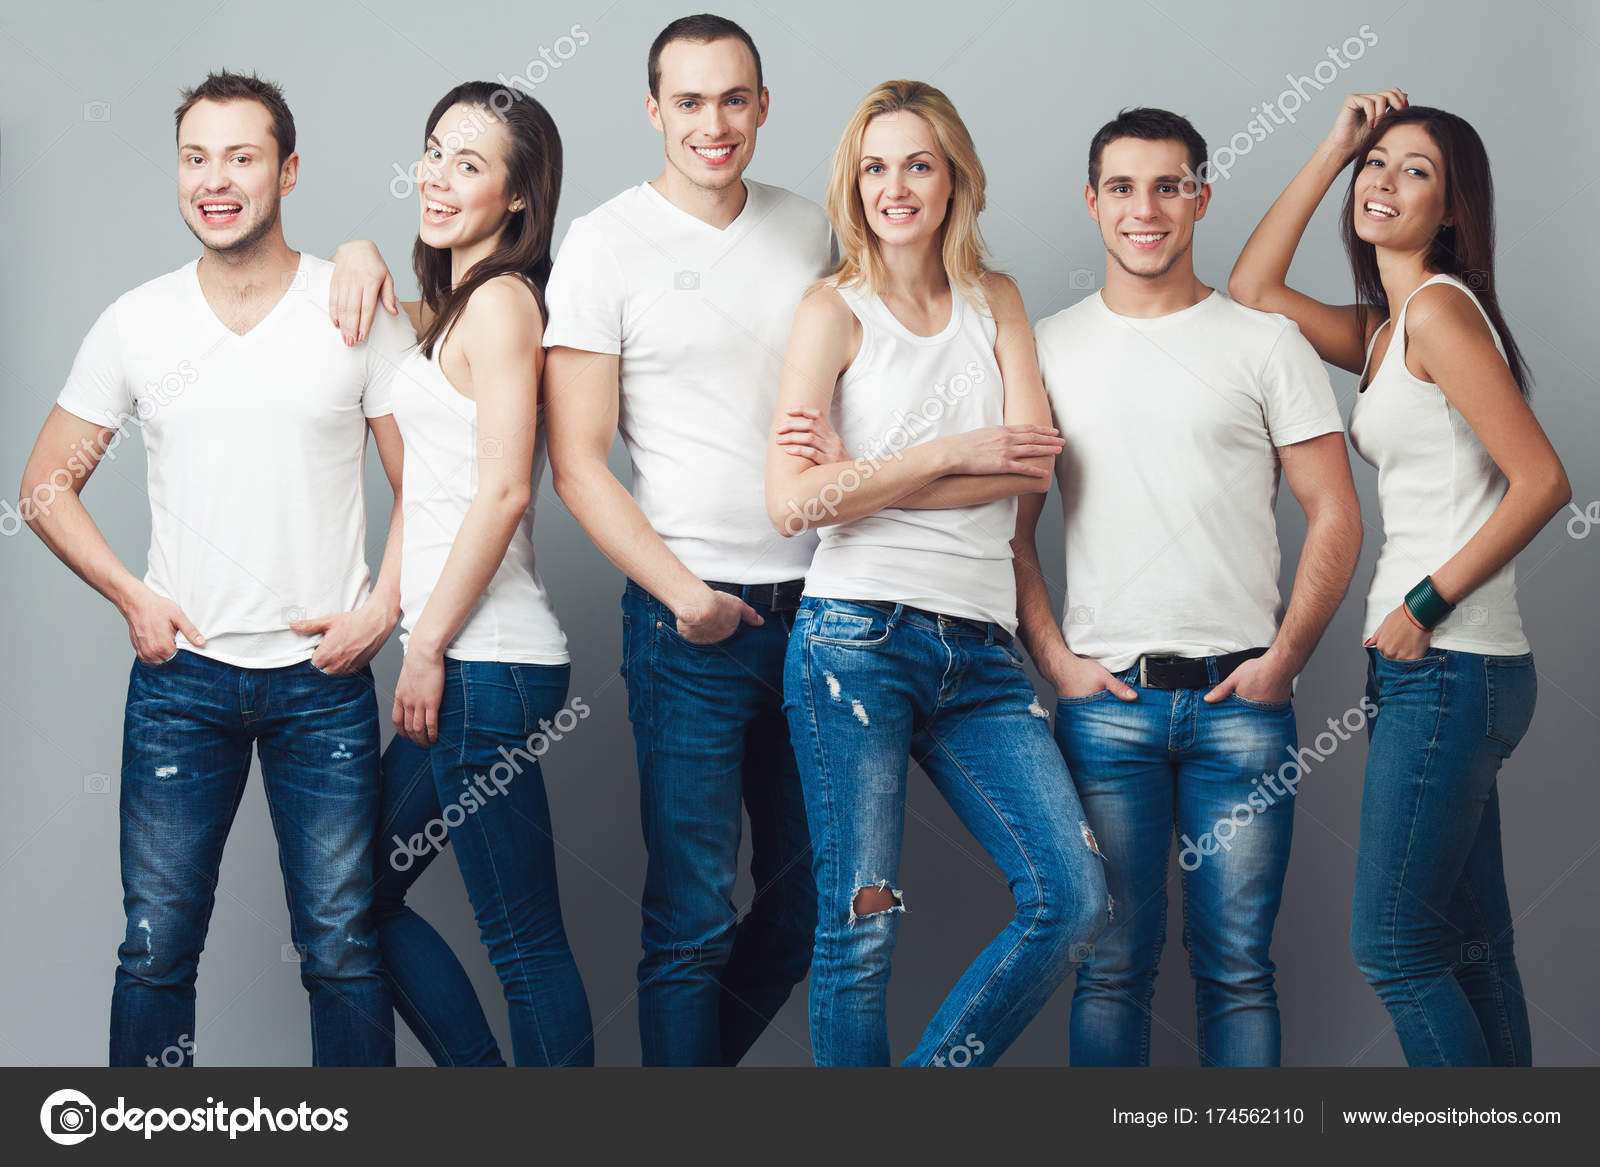 26abc3199b69 Ομάδα πορτρέτο του υγιή αγόρια και κορίτσια σε λευκό t-shirts, αμάνικο  πουκάμισα και τζιν μπλε μόνιμη και ποζάρουν πέρα από το γκρι φόντο. Αστικό  ύφος.